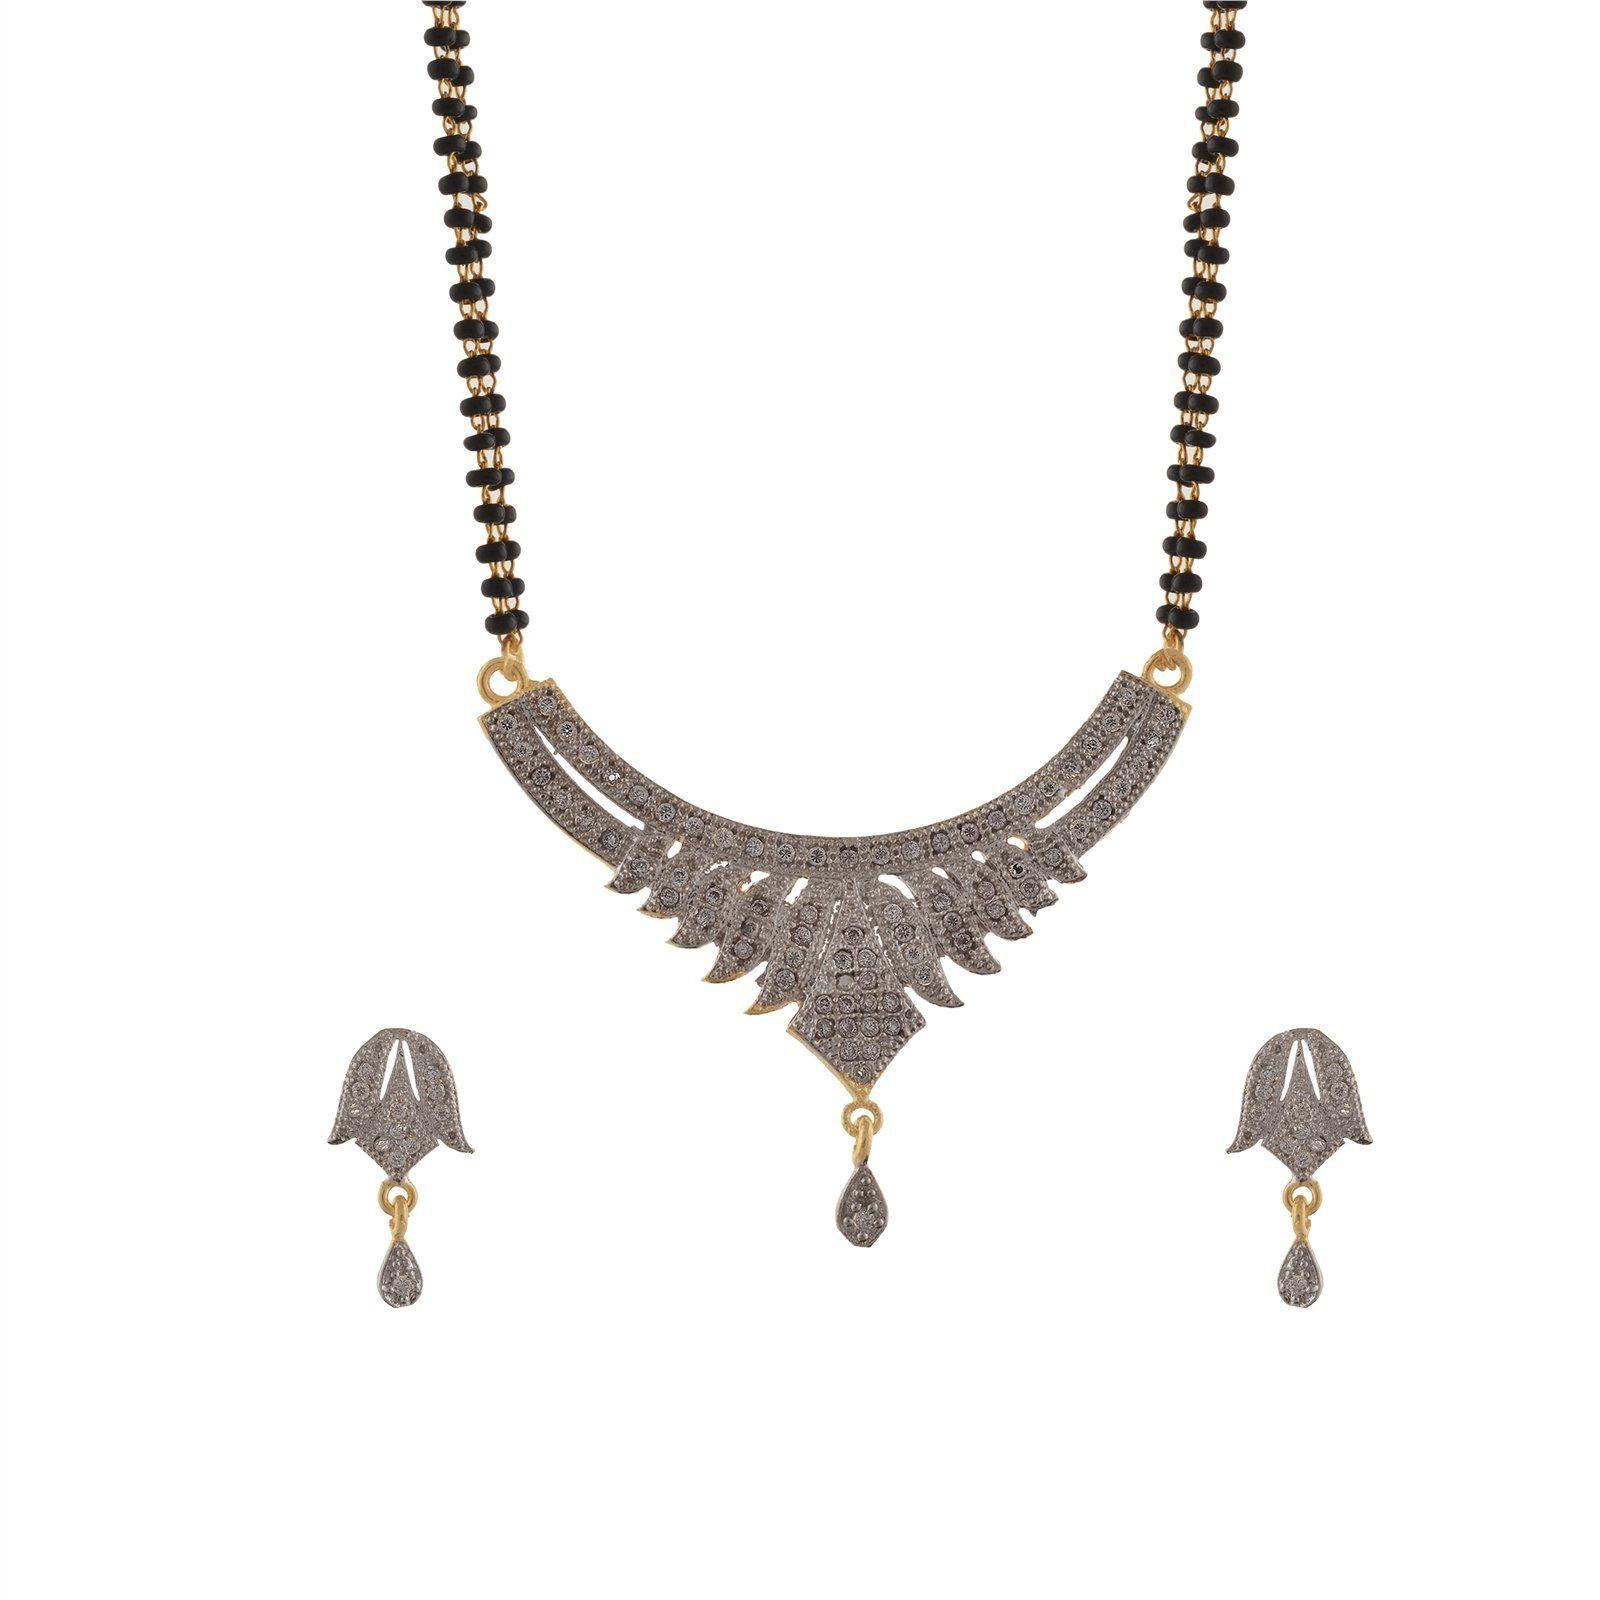 Zephyrr fashion lotus design ad mangalsutra pendant earrings set